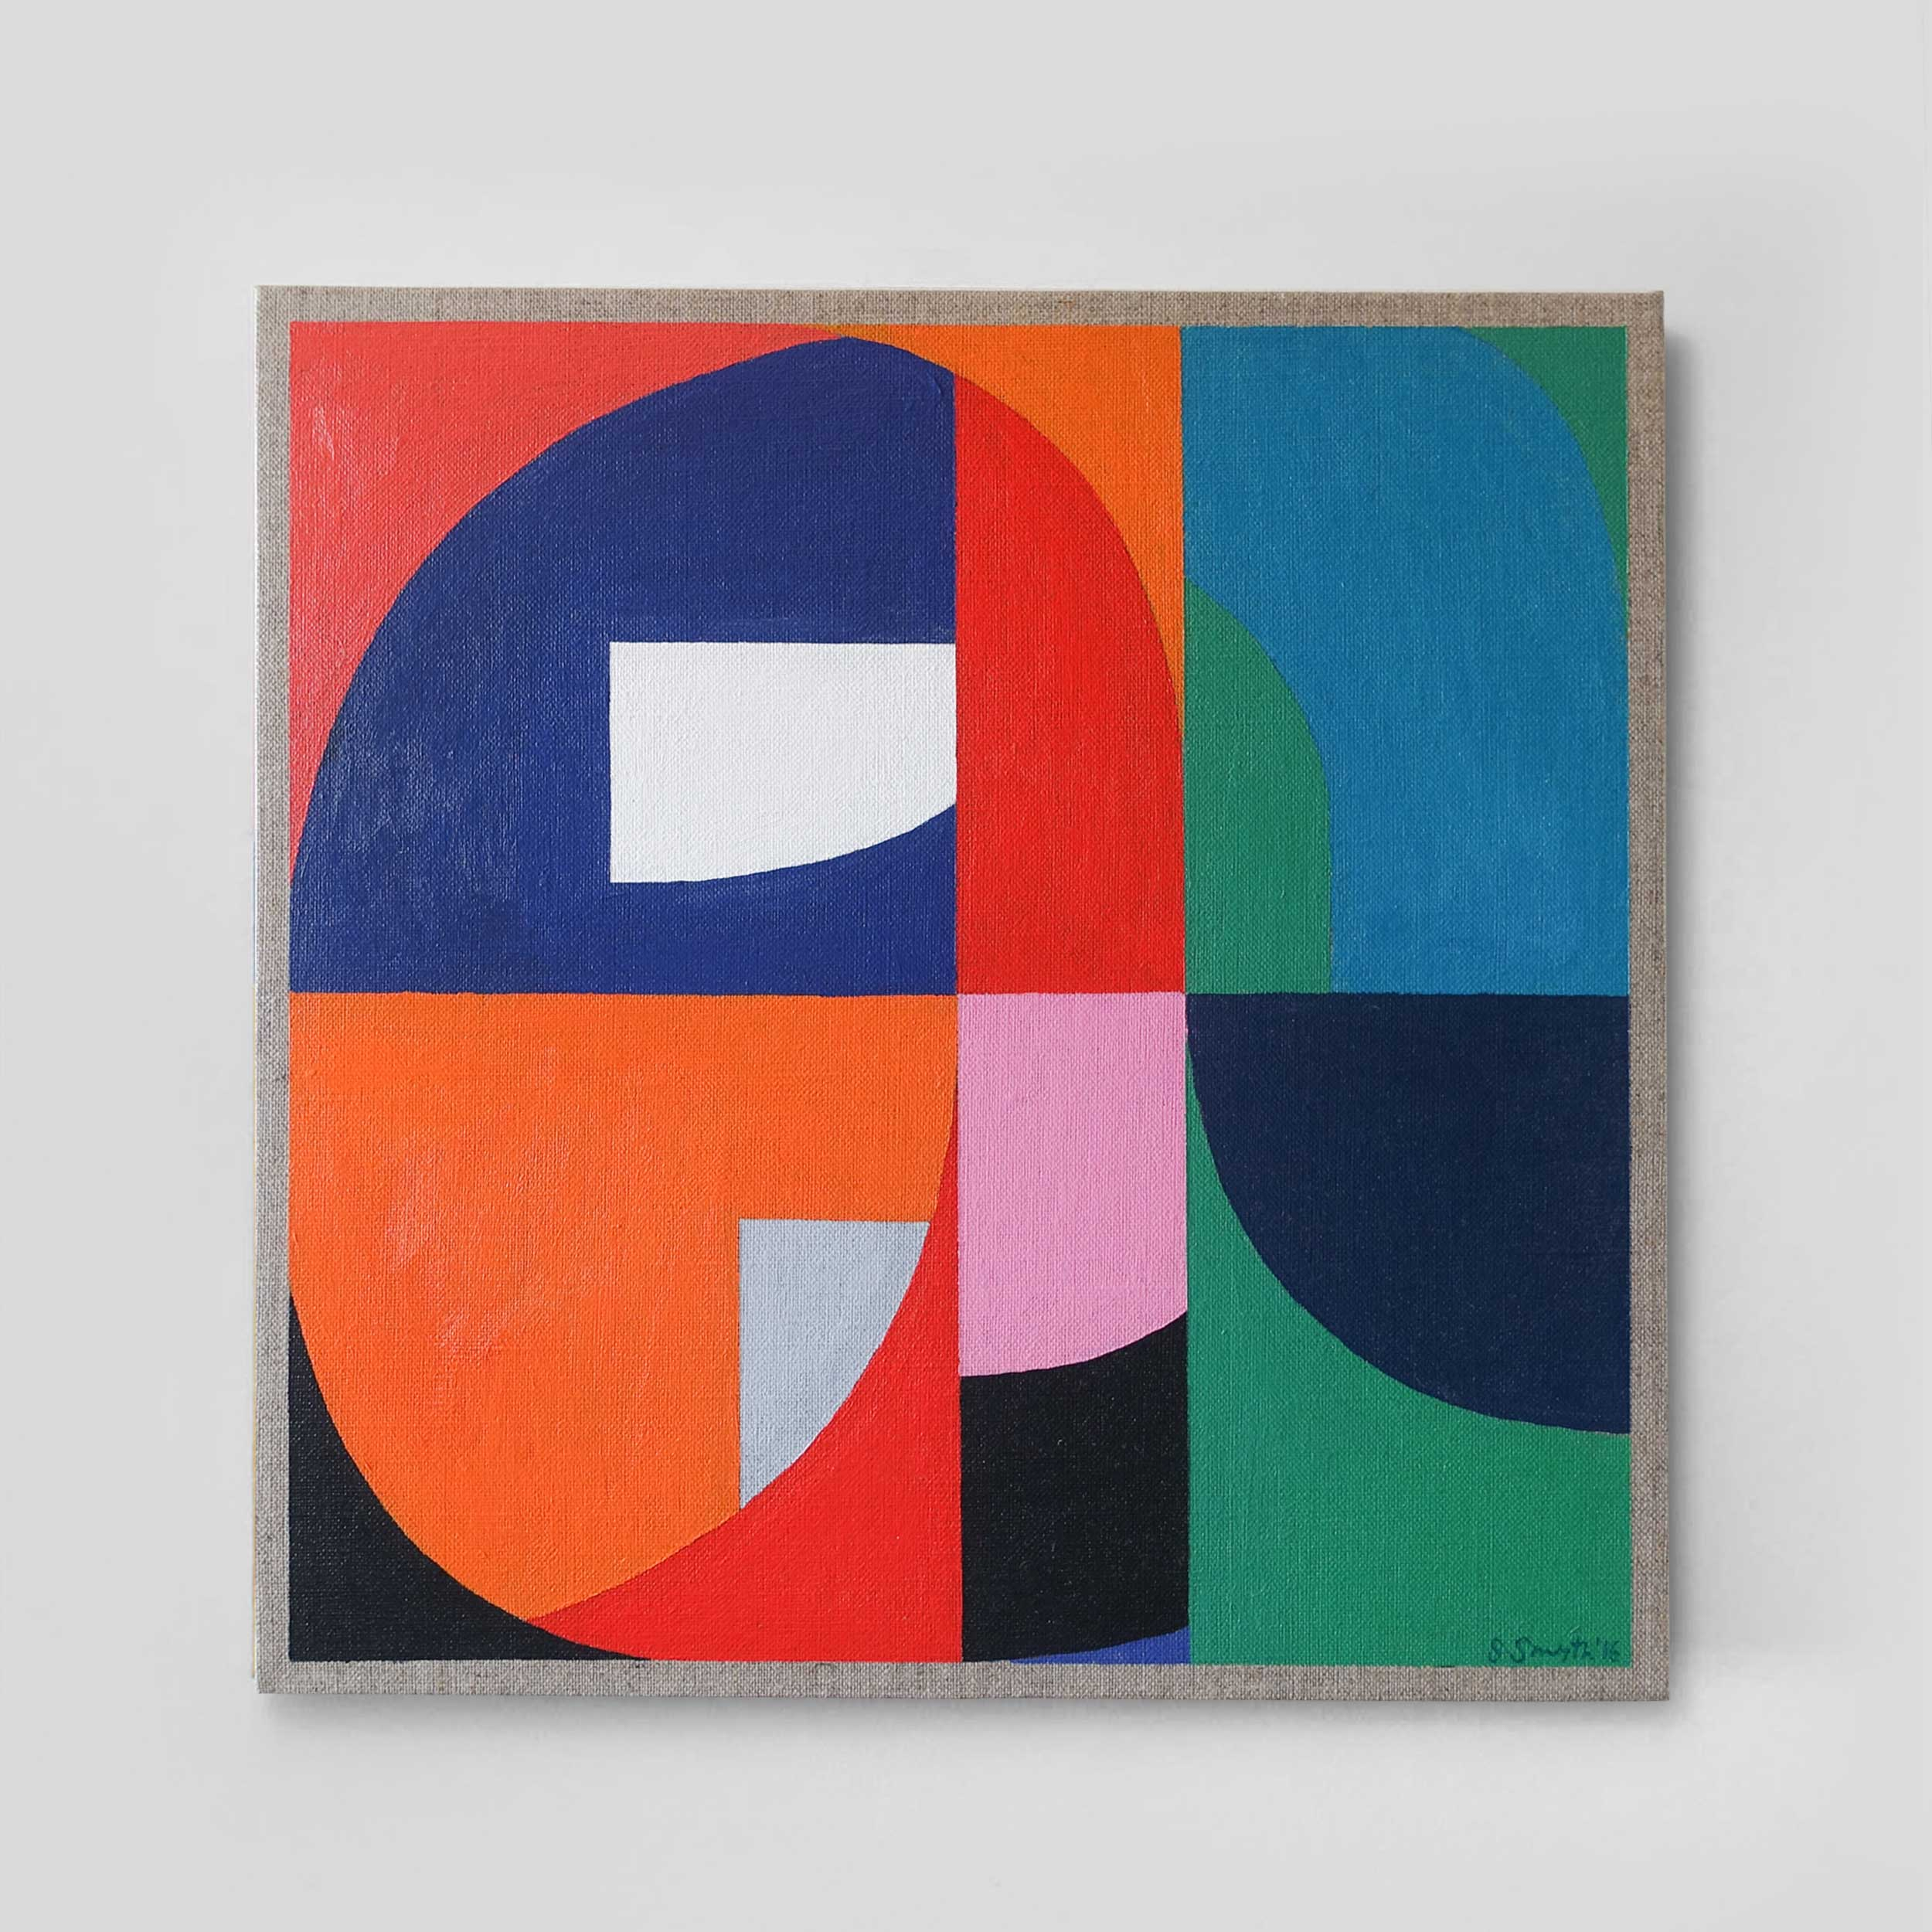 Square-canvas-2016-sam-smyth.jpg